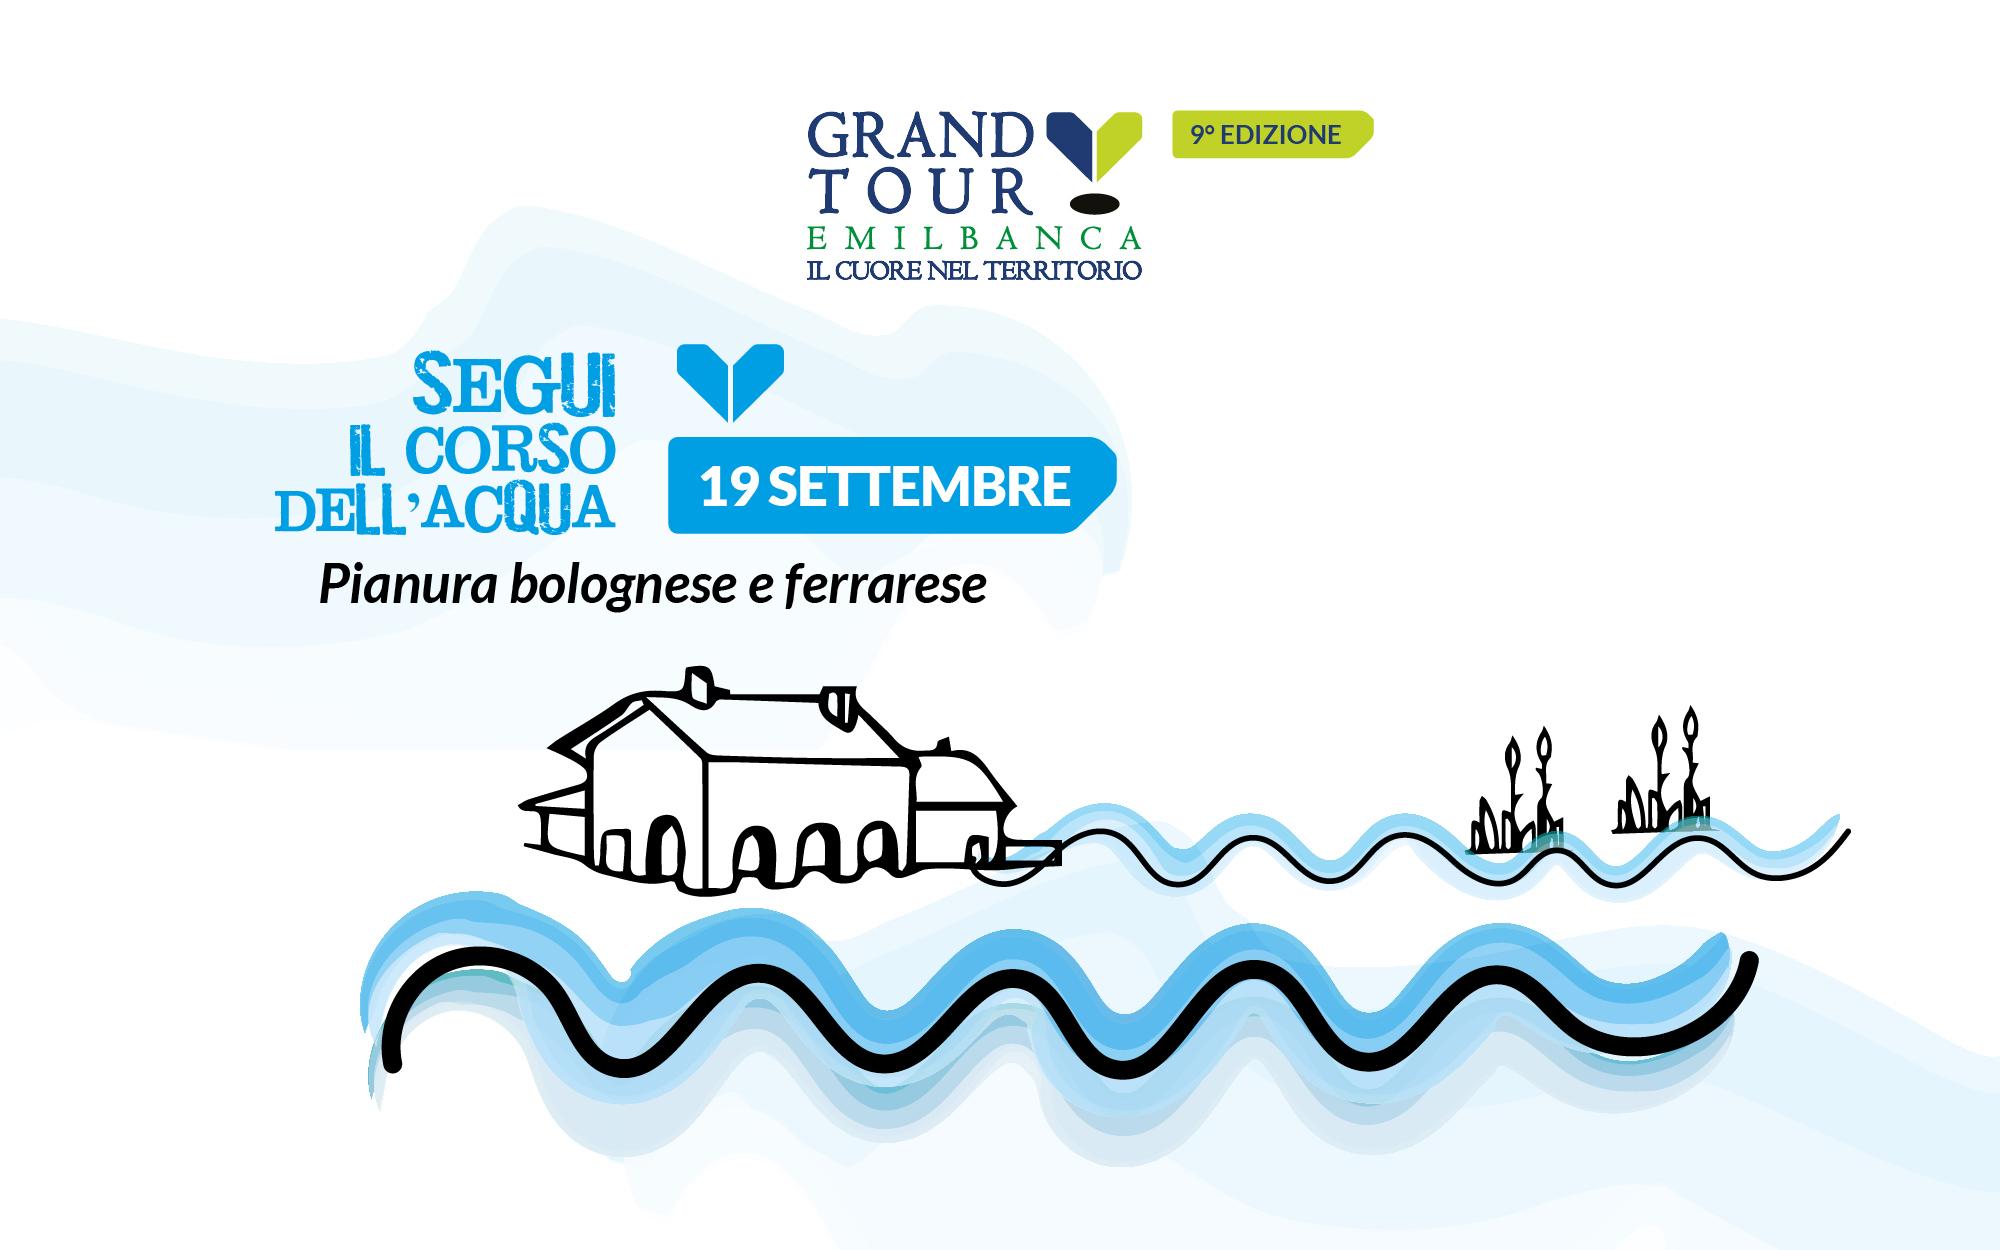 Grand Tour Emil Banca